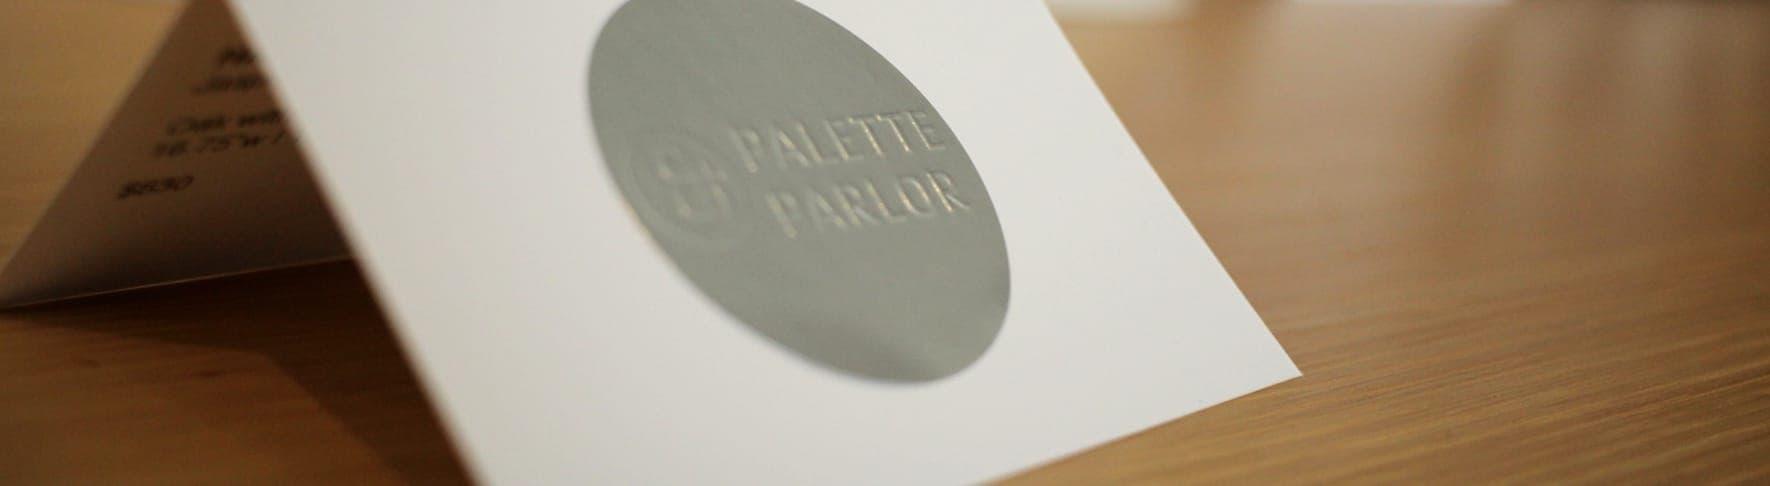 Print design of the Palette & Parlor logos